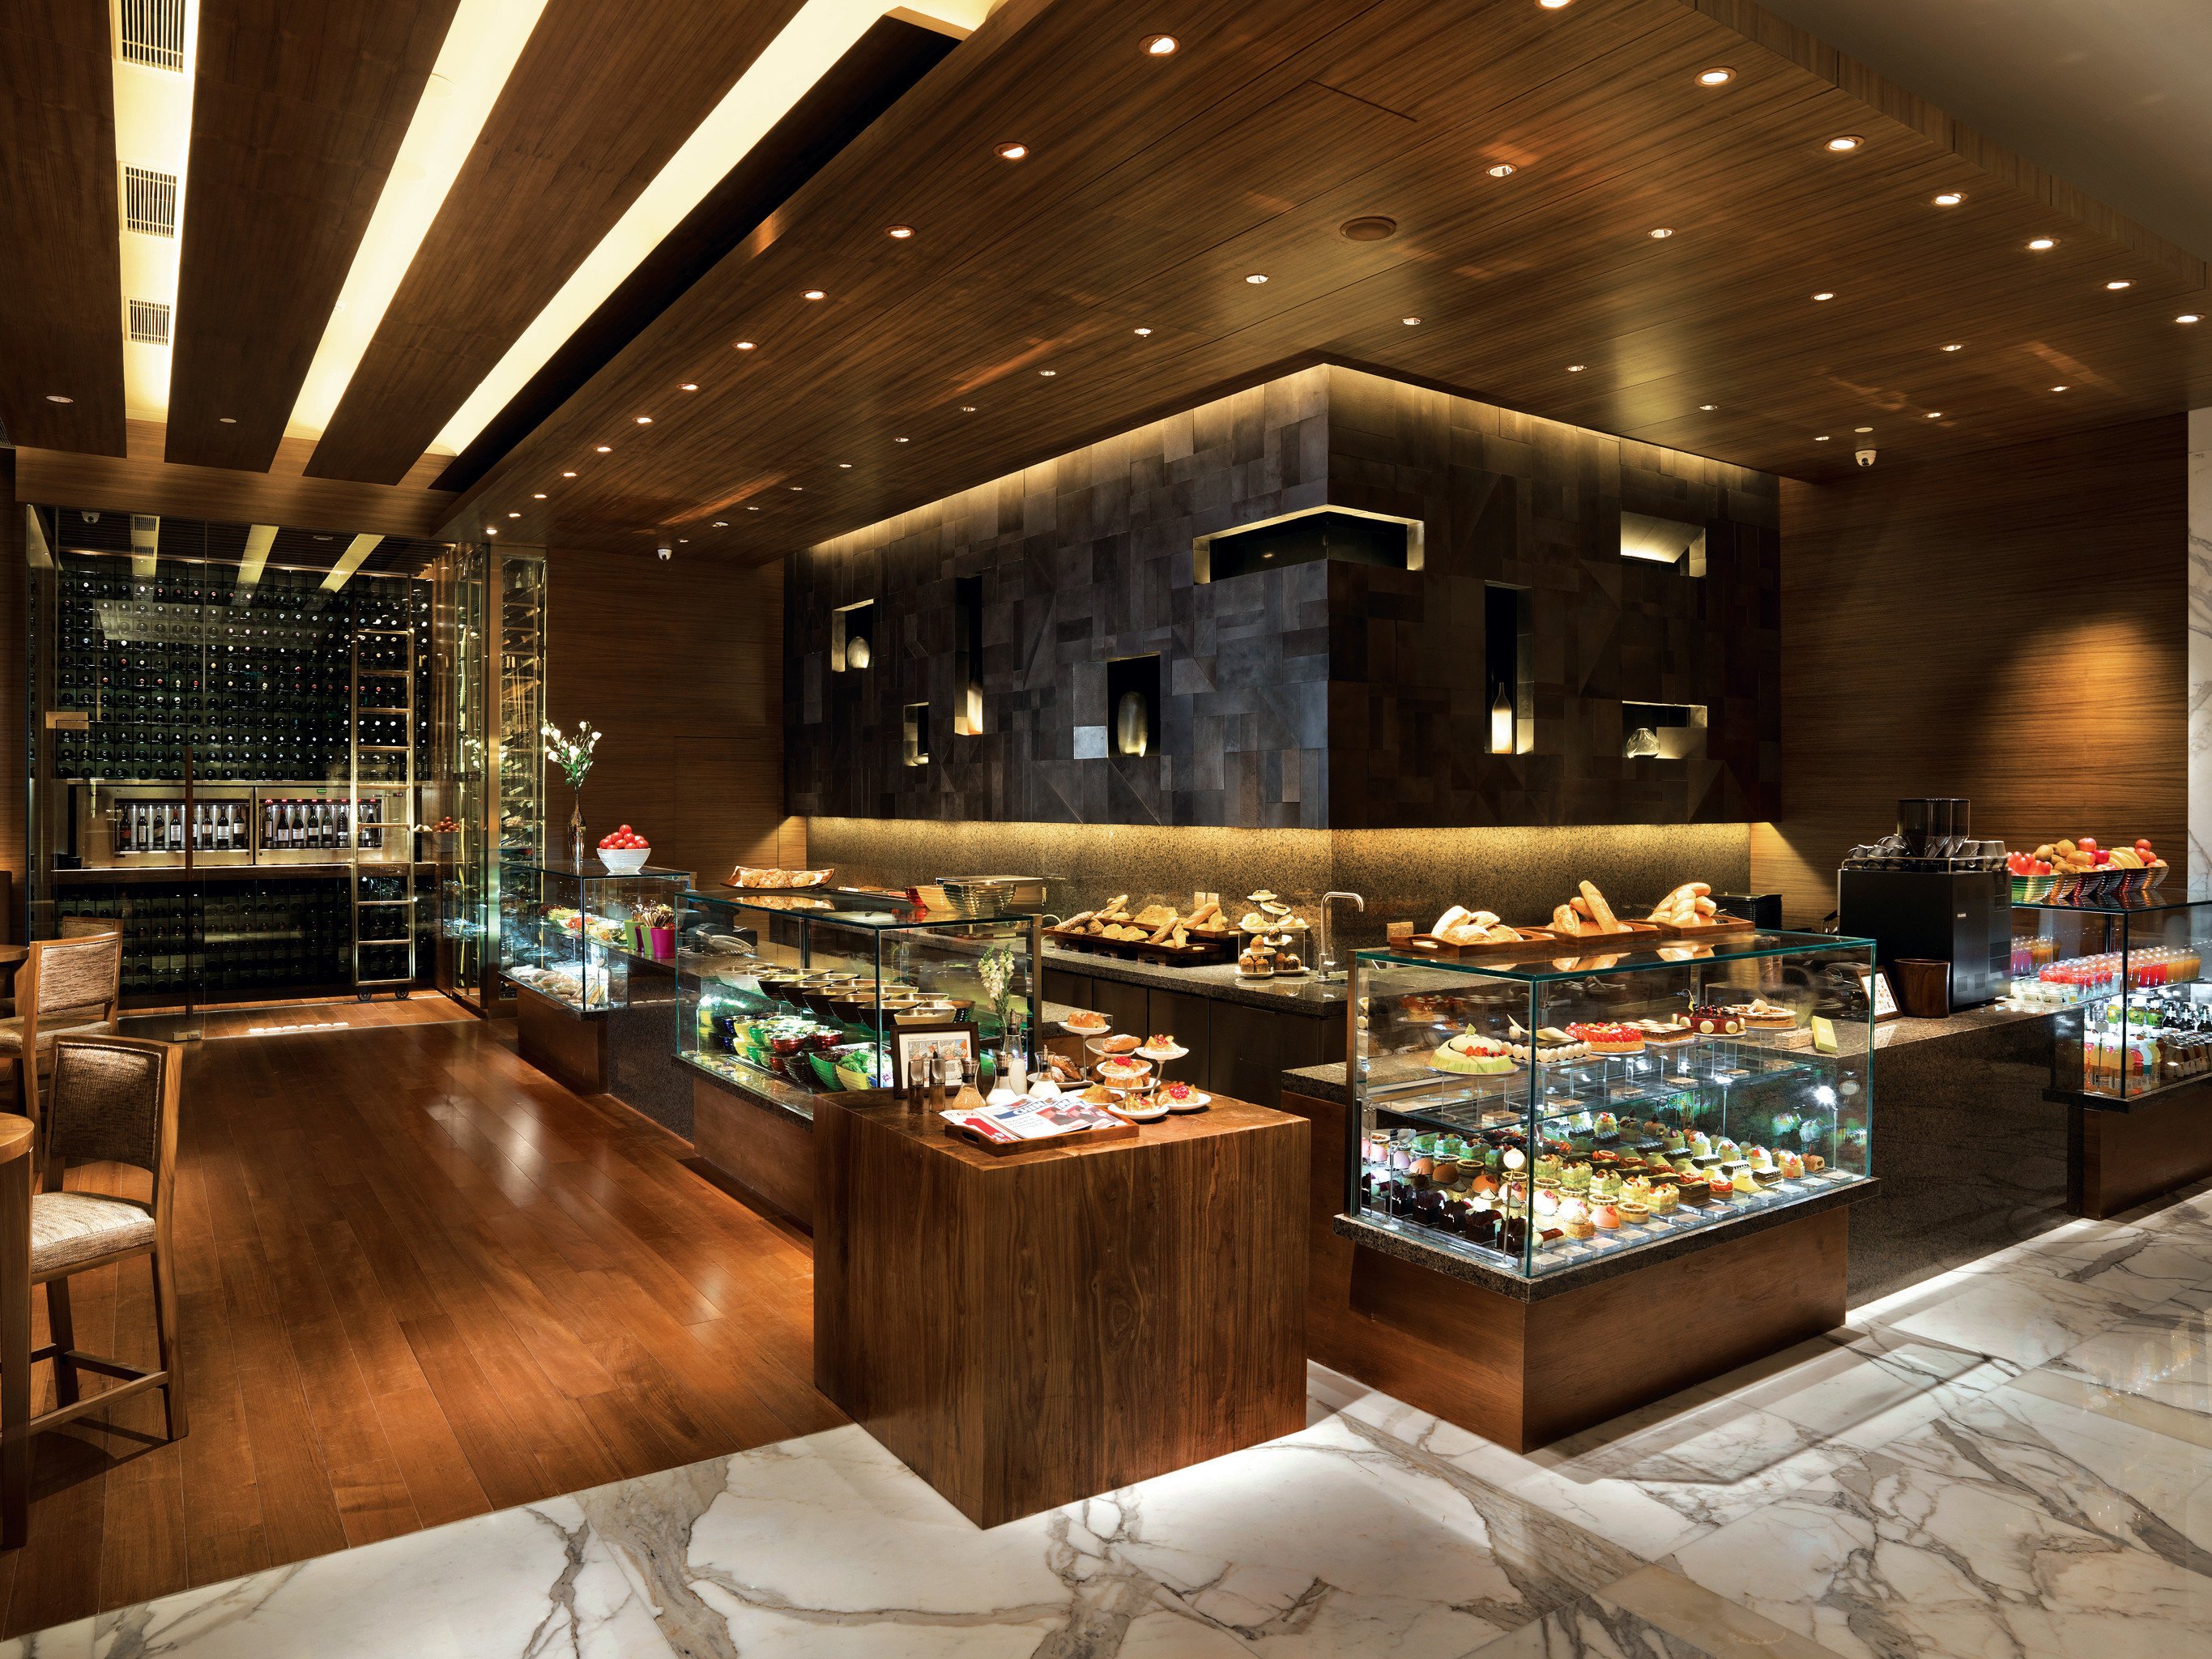 Adult-only Bar Dining Drink Eat Modern Nightlife Lobby recreation room restaurant